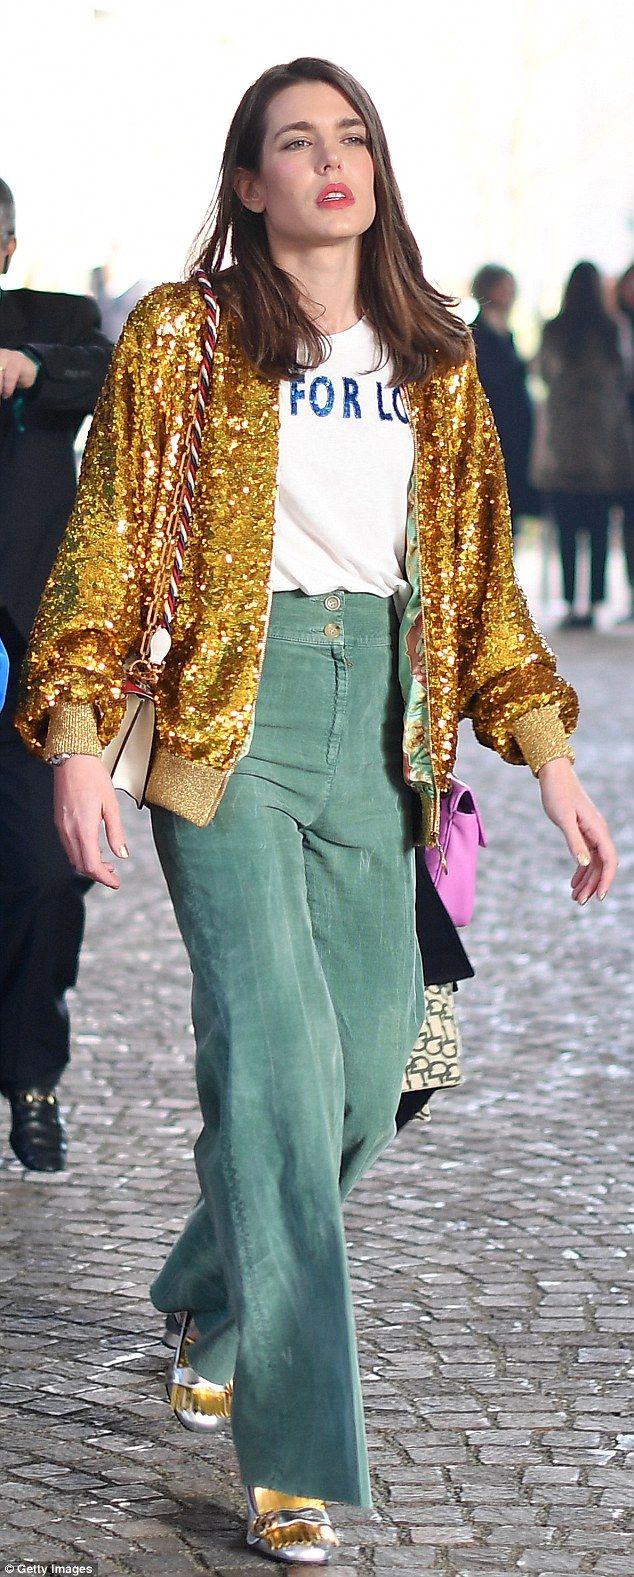 Charlotte Casiraghi is still a Gucci girl at Milan Fashion Week ...